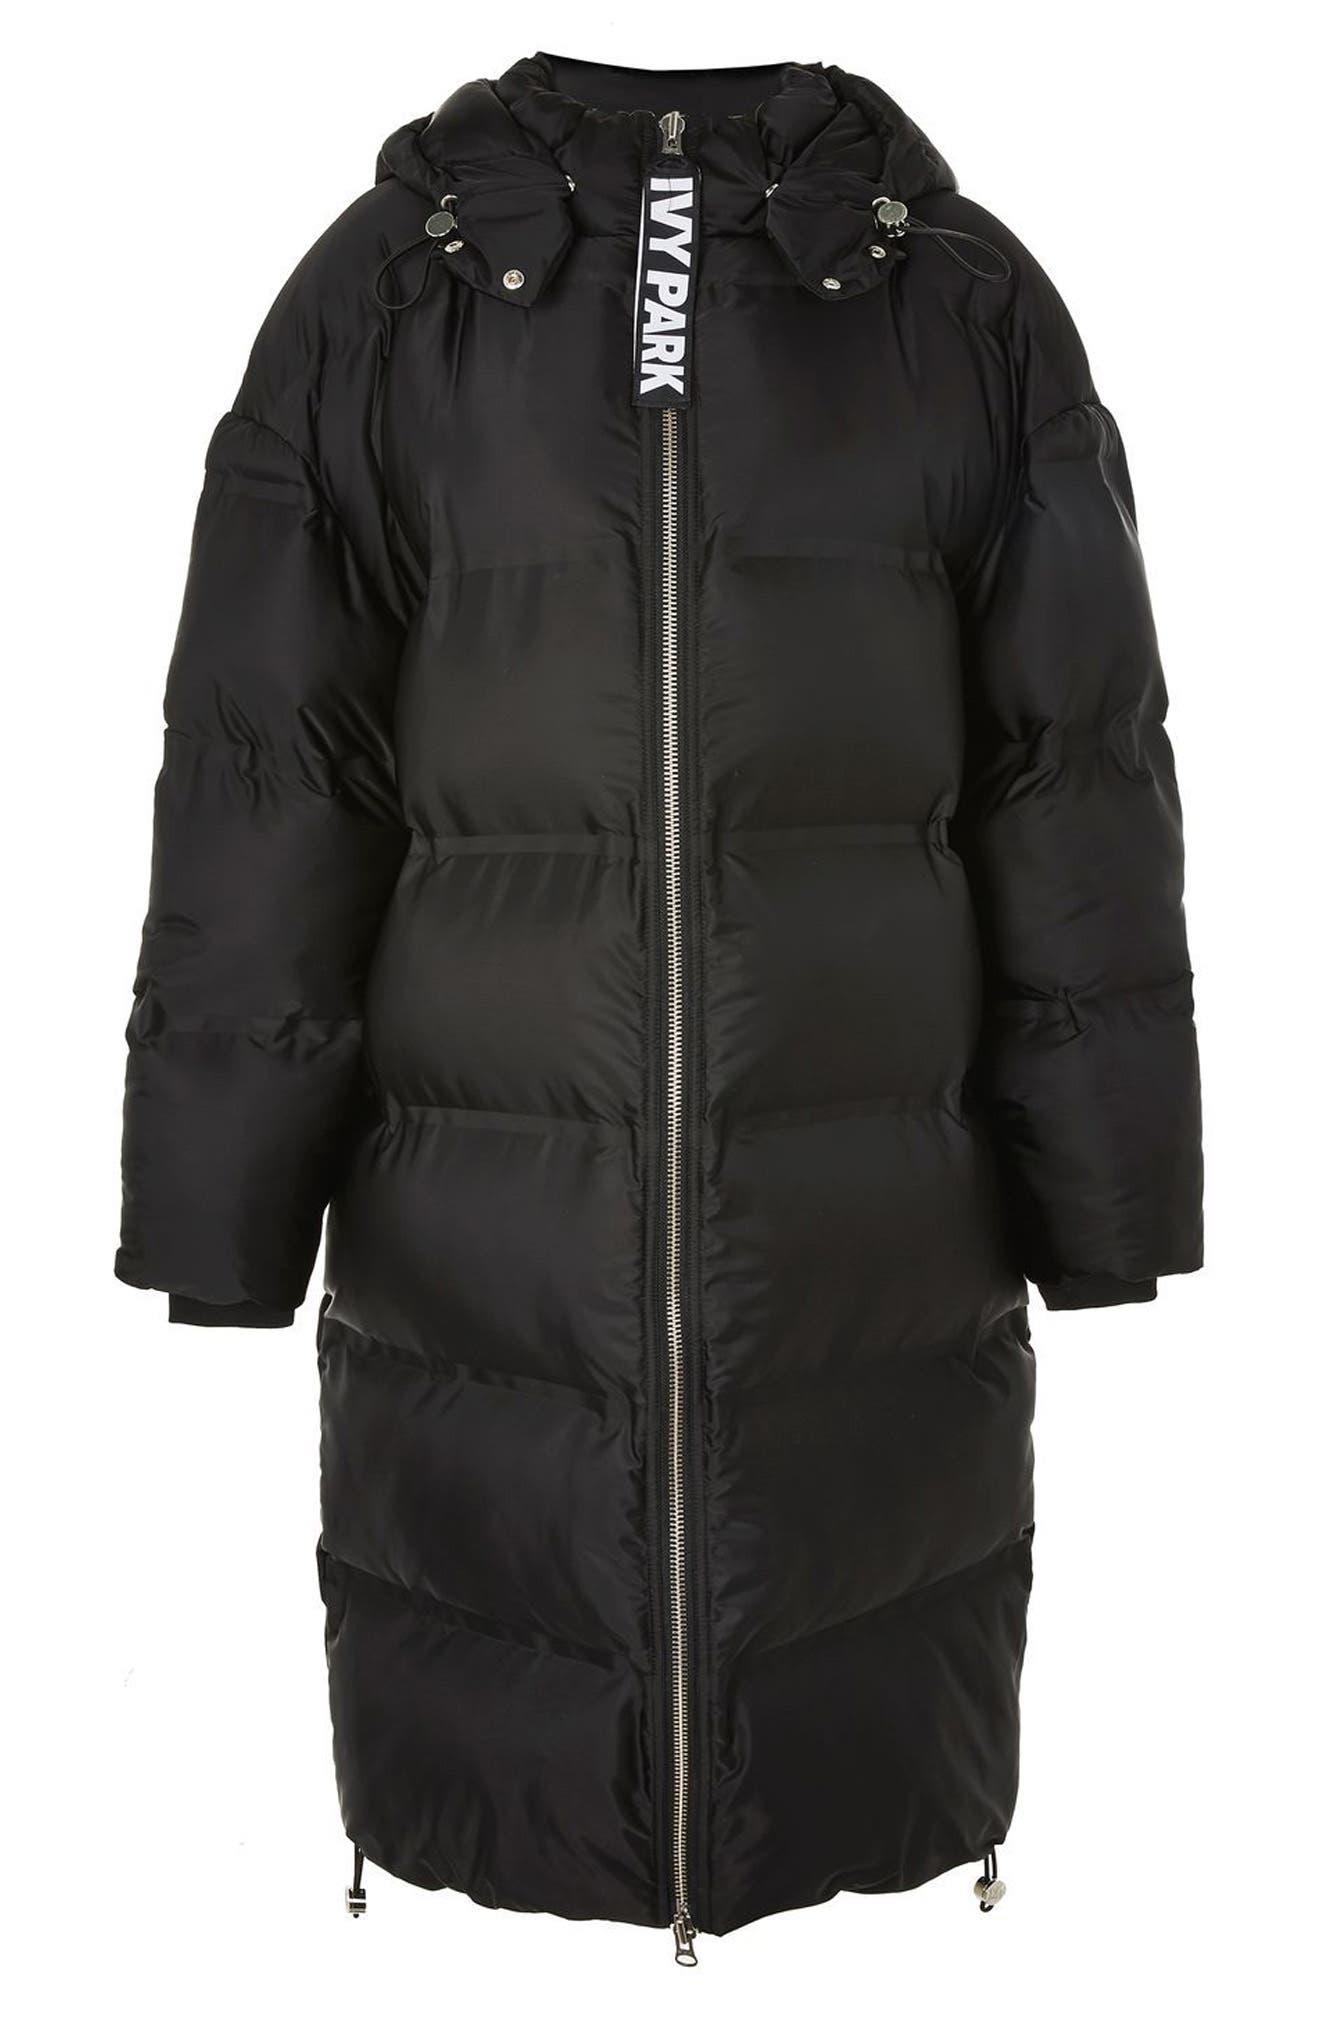 Alternate Image 1 Selected - IVY PARK® Longline Bonded Puffer Jacket